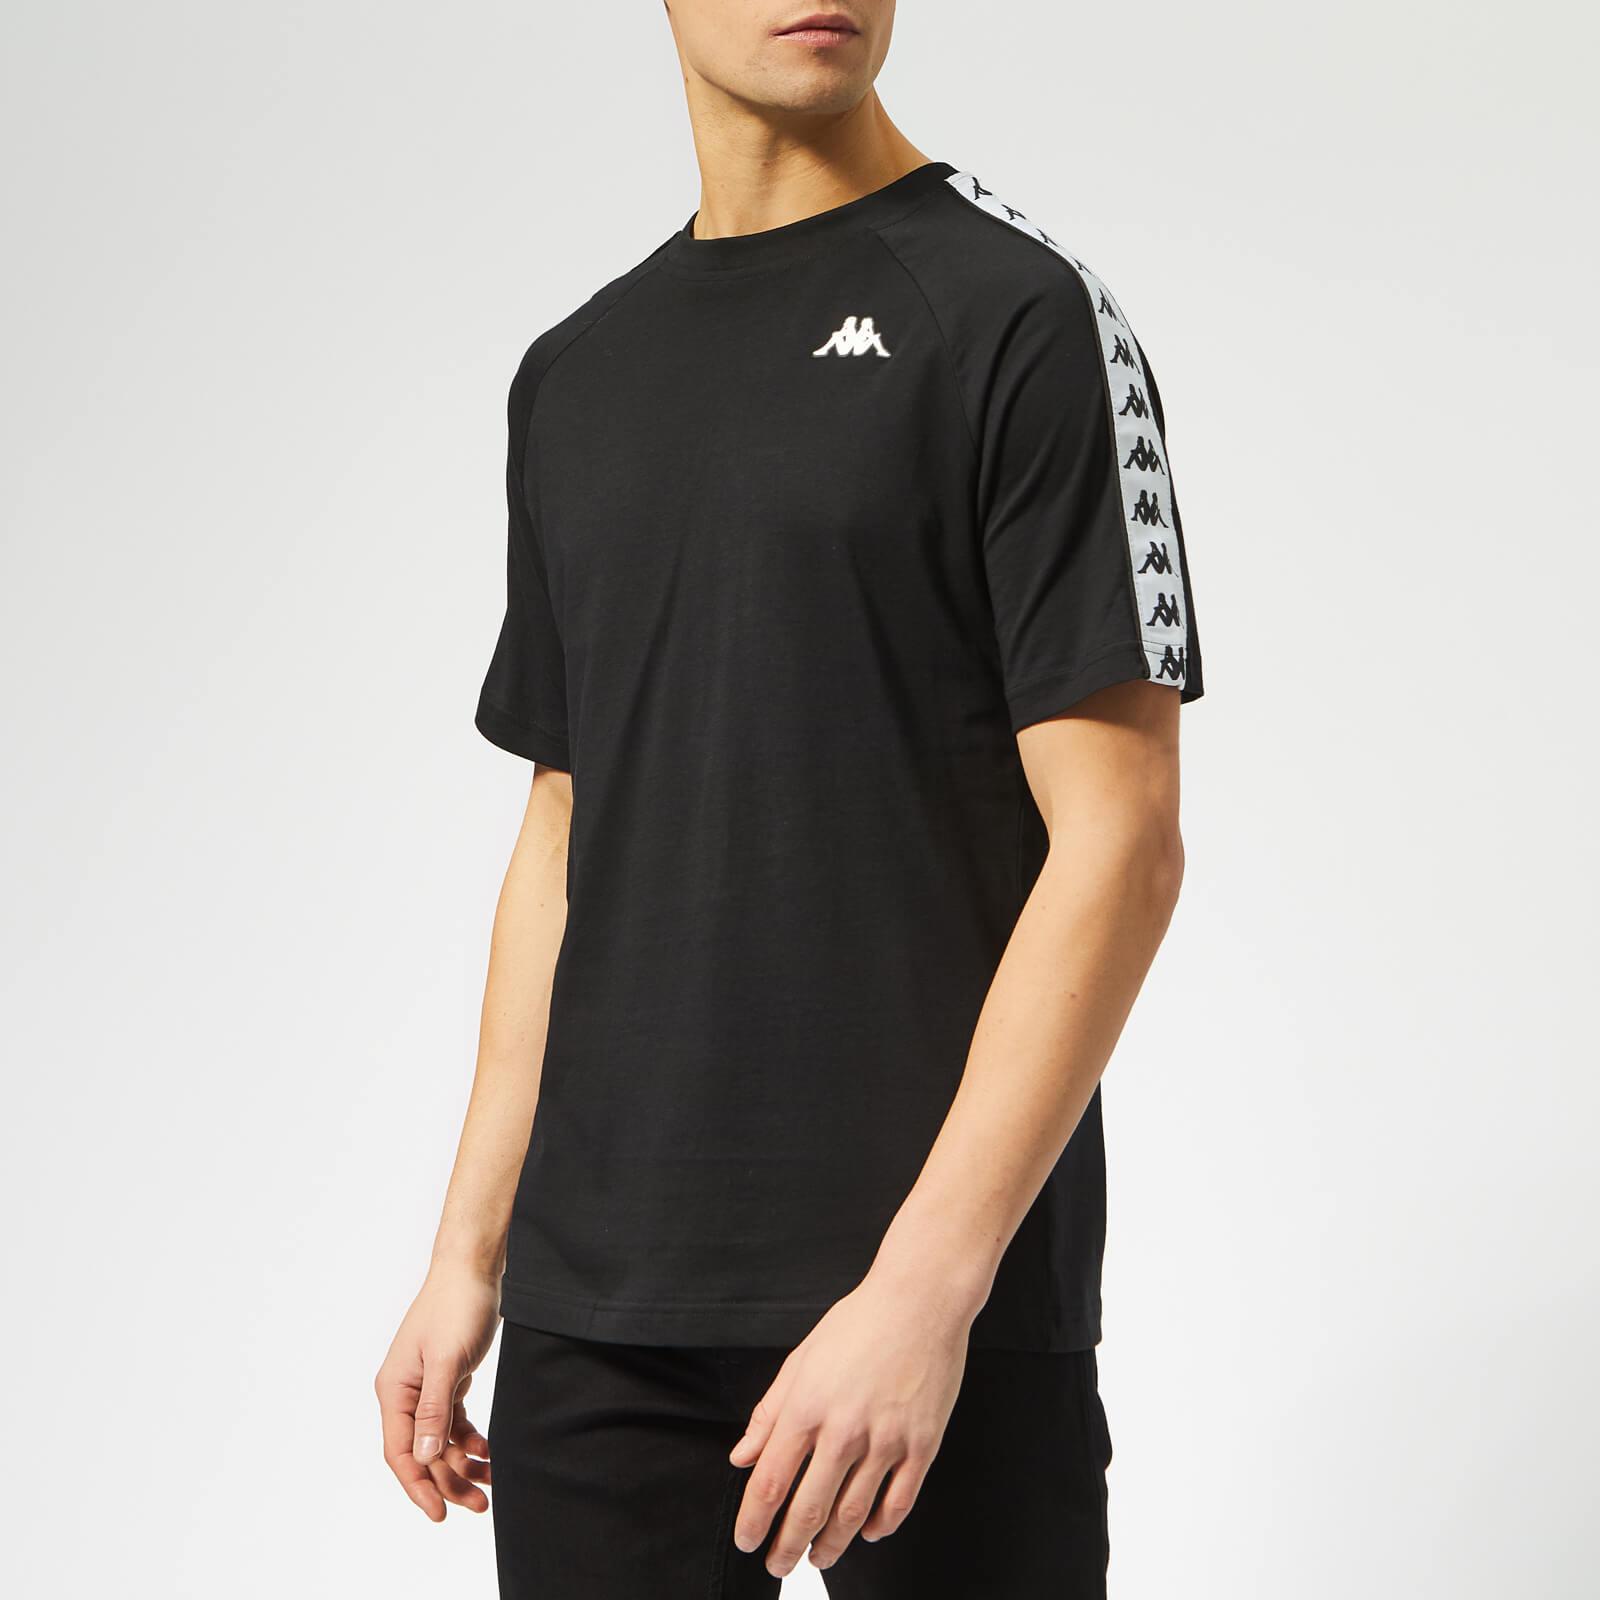 kappa t shirt black